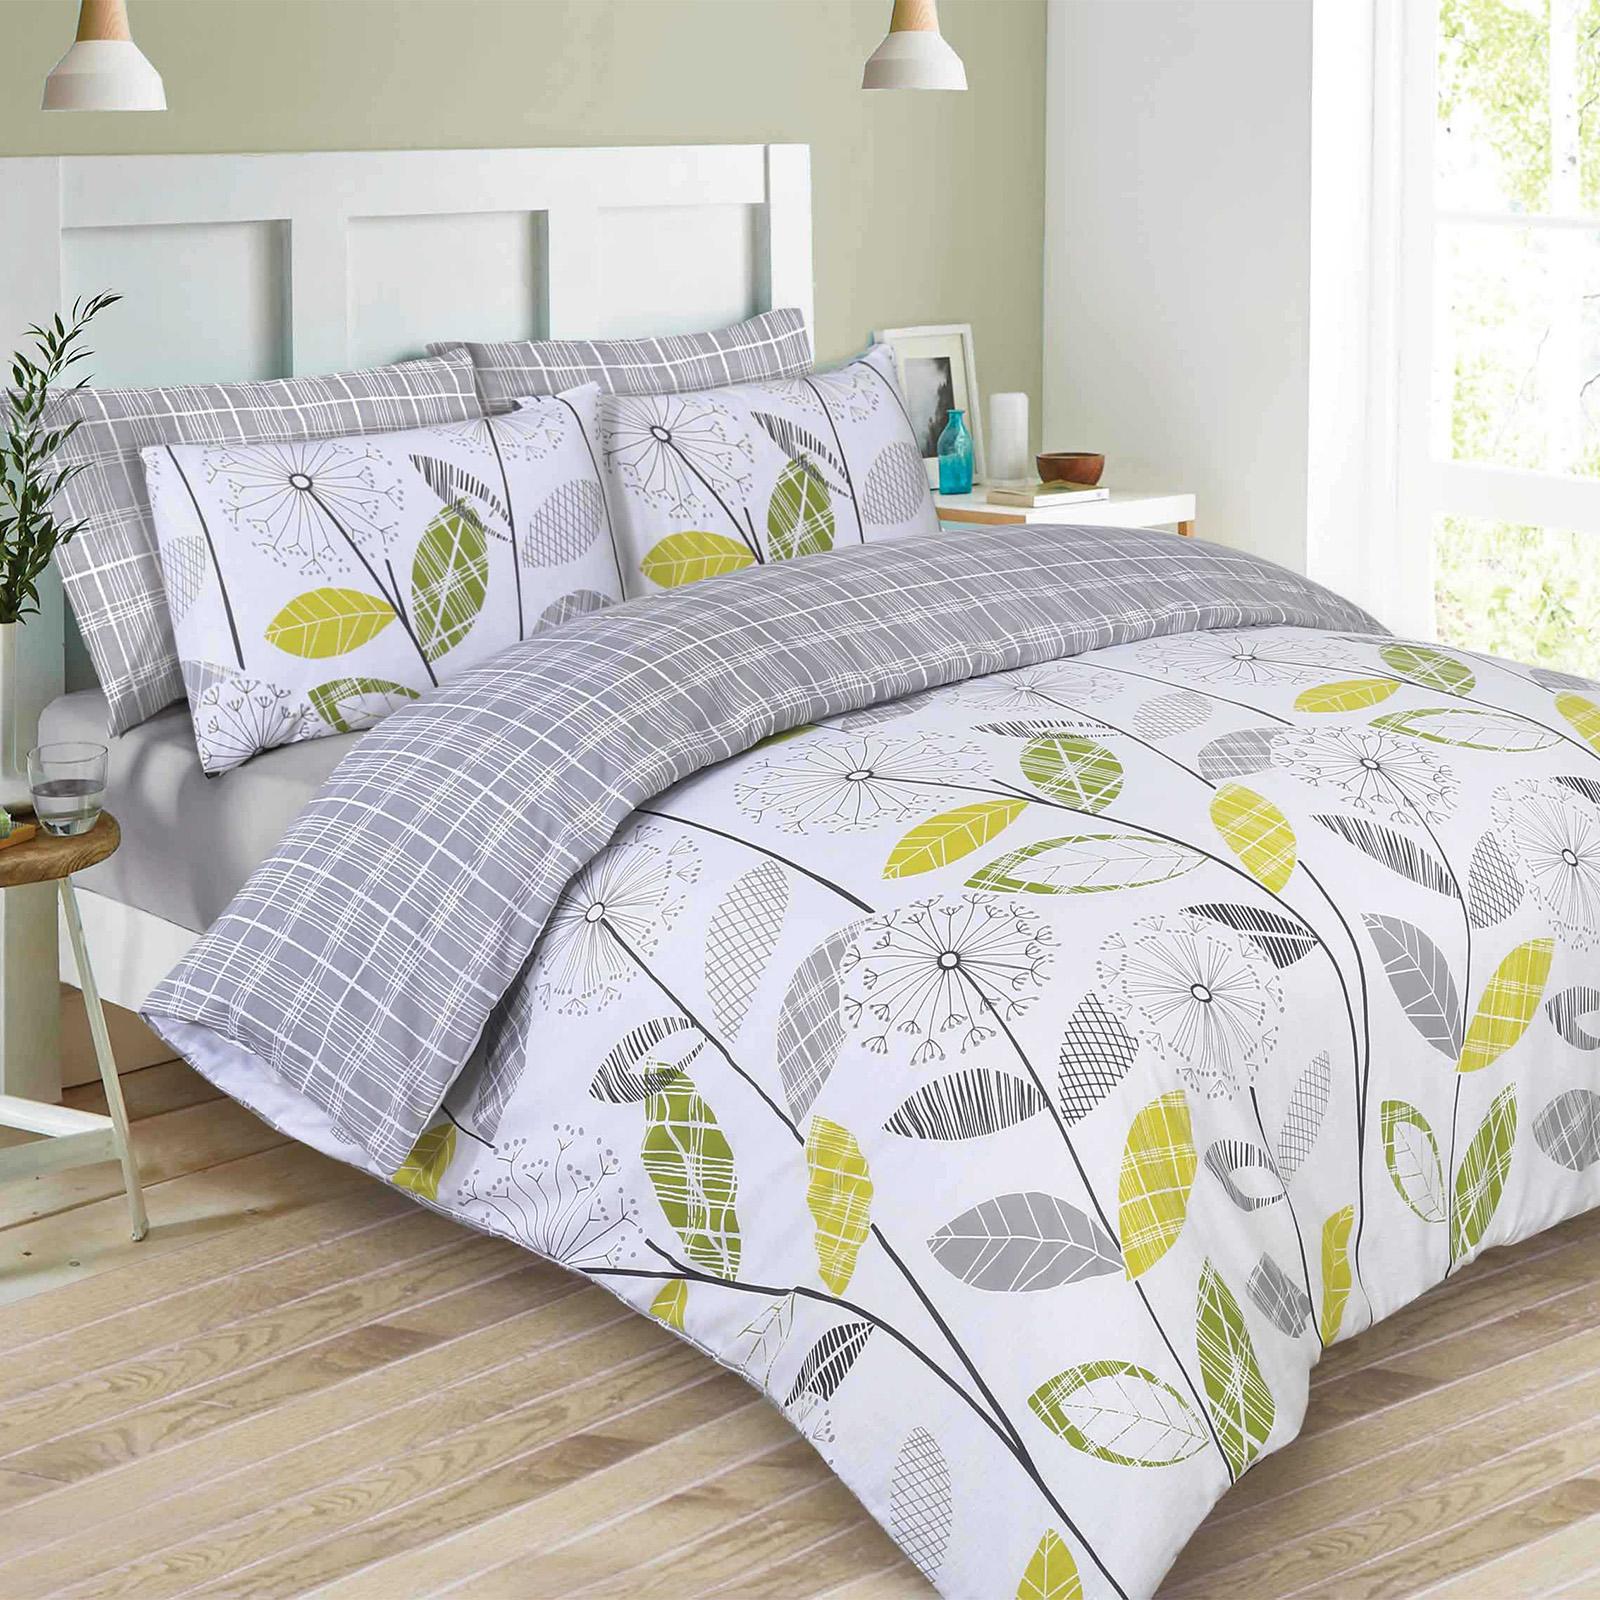 Dreamscene Duvet Cover With Pillowcase Polycotton Bedding